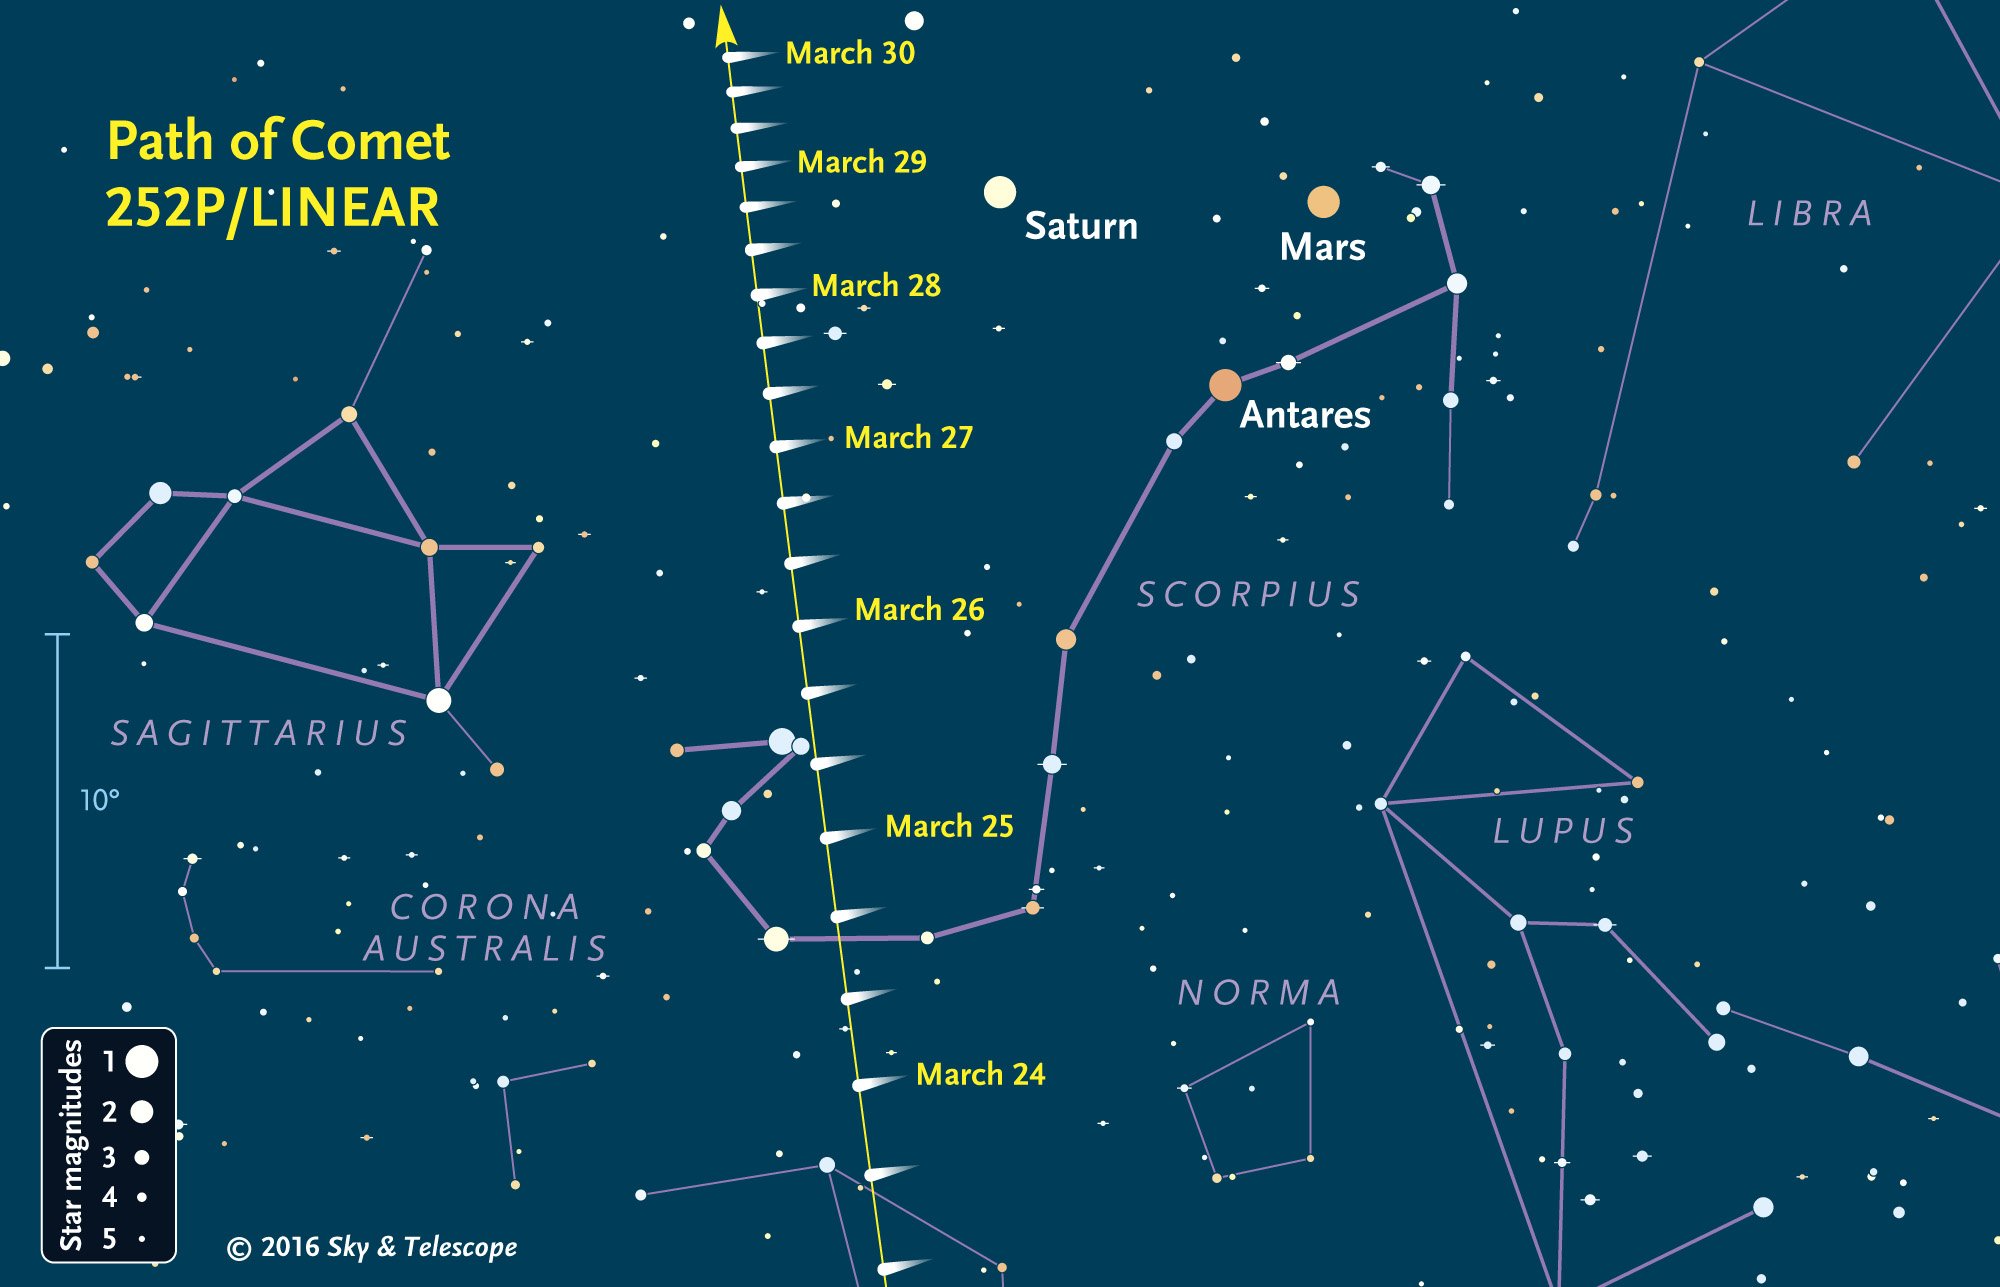 Finder chart for Comet 252P